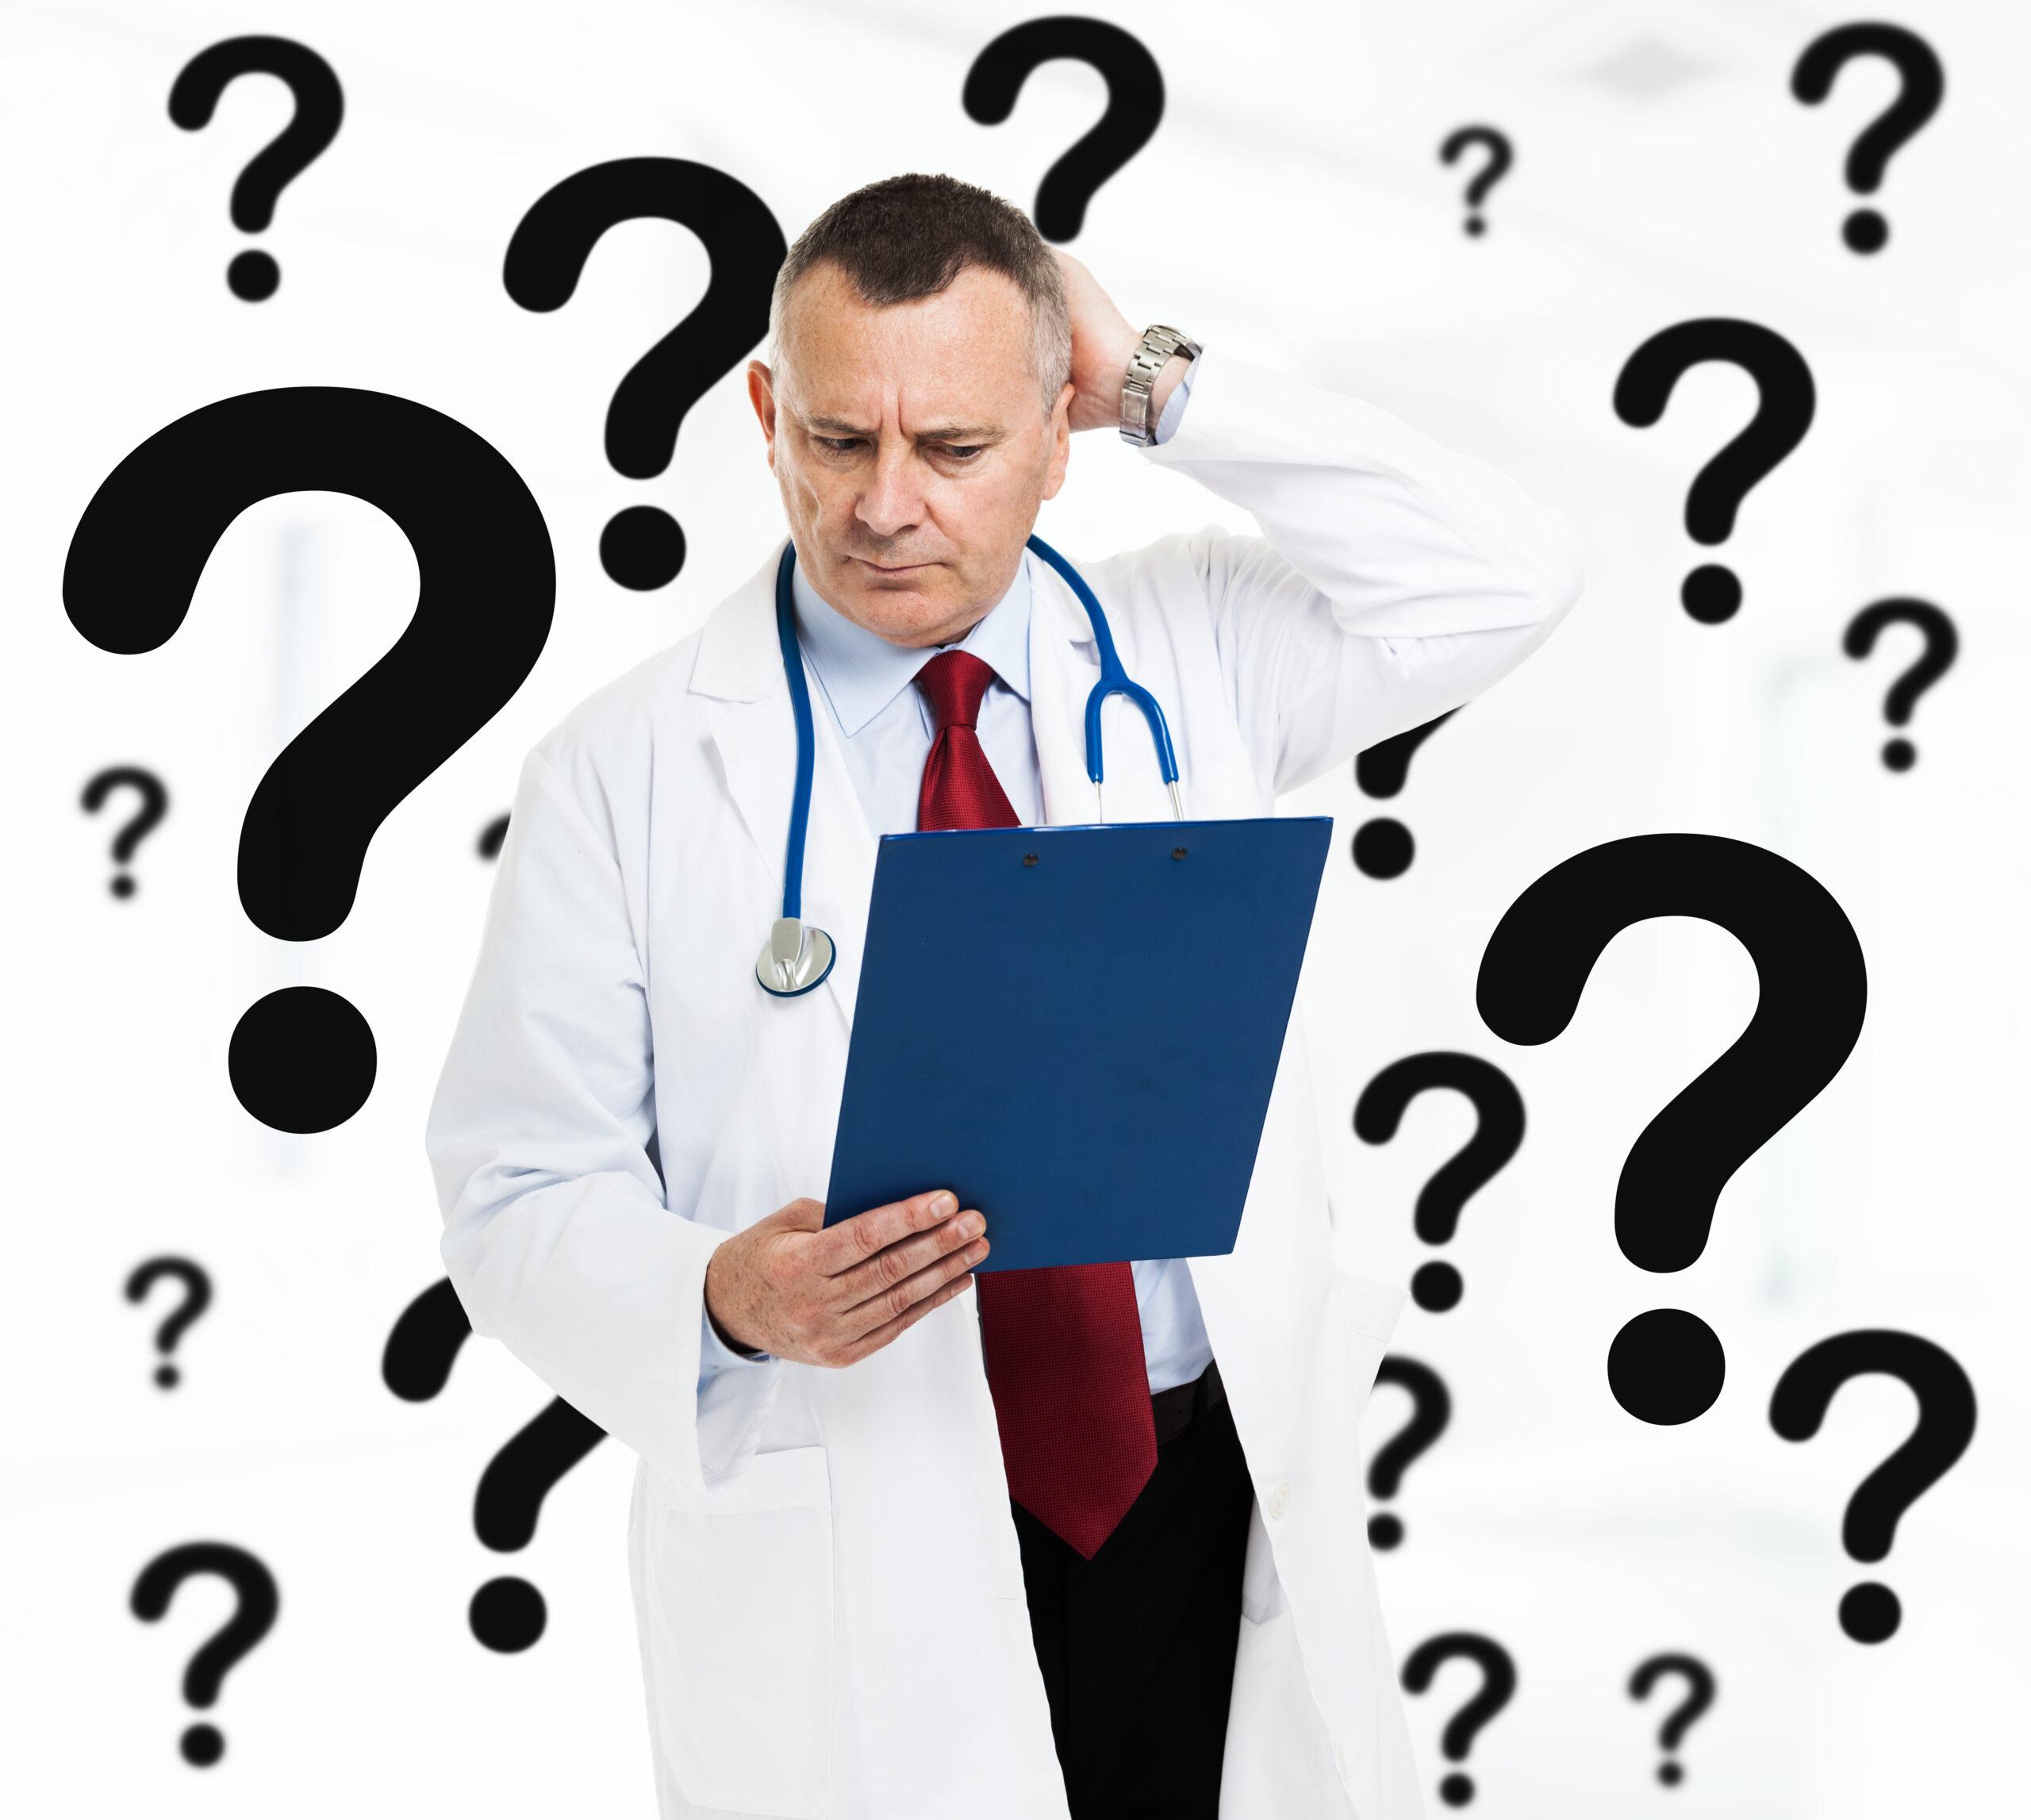 Doctor looking confused. Doctors don't understand celiac disease or gluten sensitivity